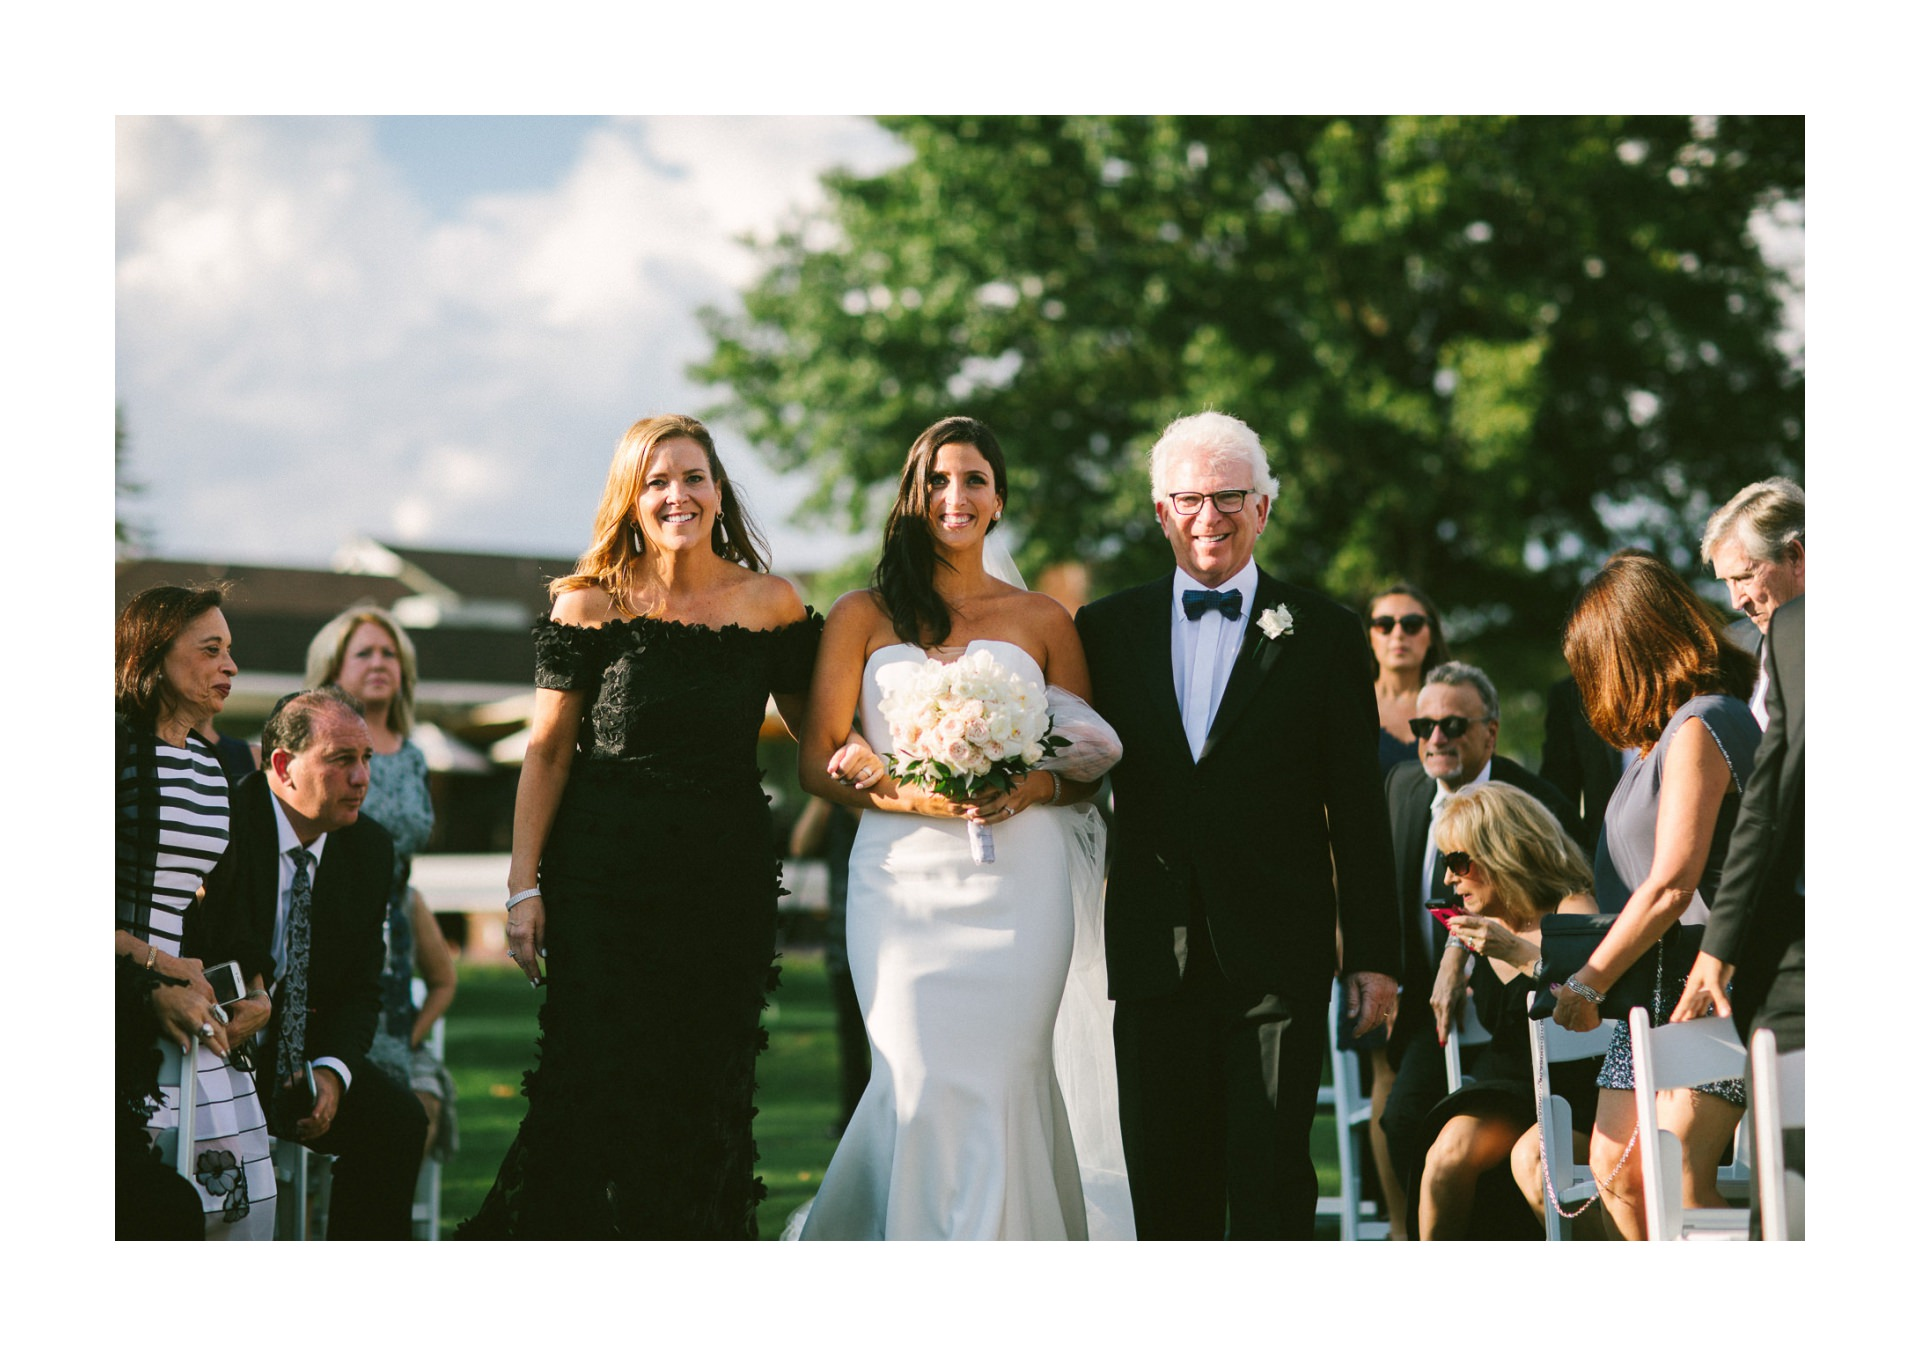 Beechmont Country Club Wedding Photographer in Beachwood 2 17.jpg